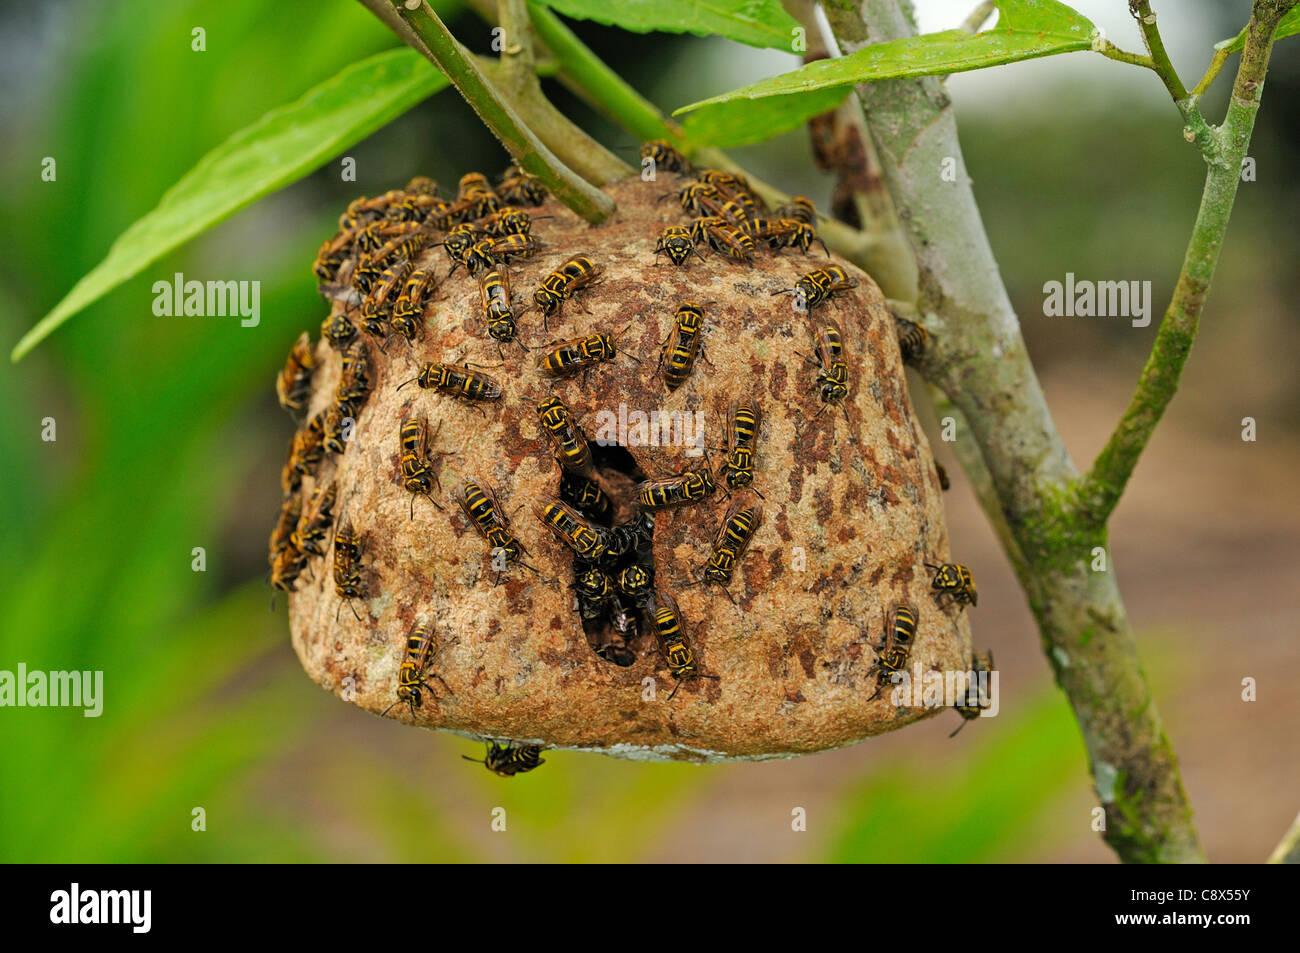 Communal Wasp (Vespidae) several walking on nest surface, nest hanging in bush, Yasuni National Park, Ecuador - Stock Image